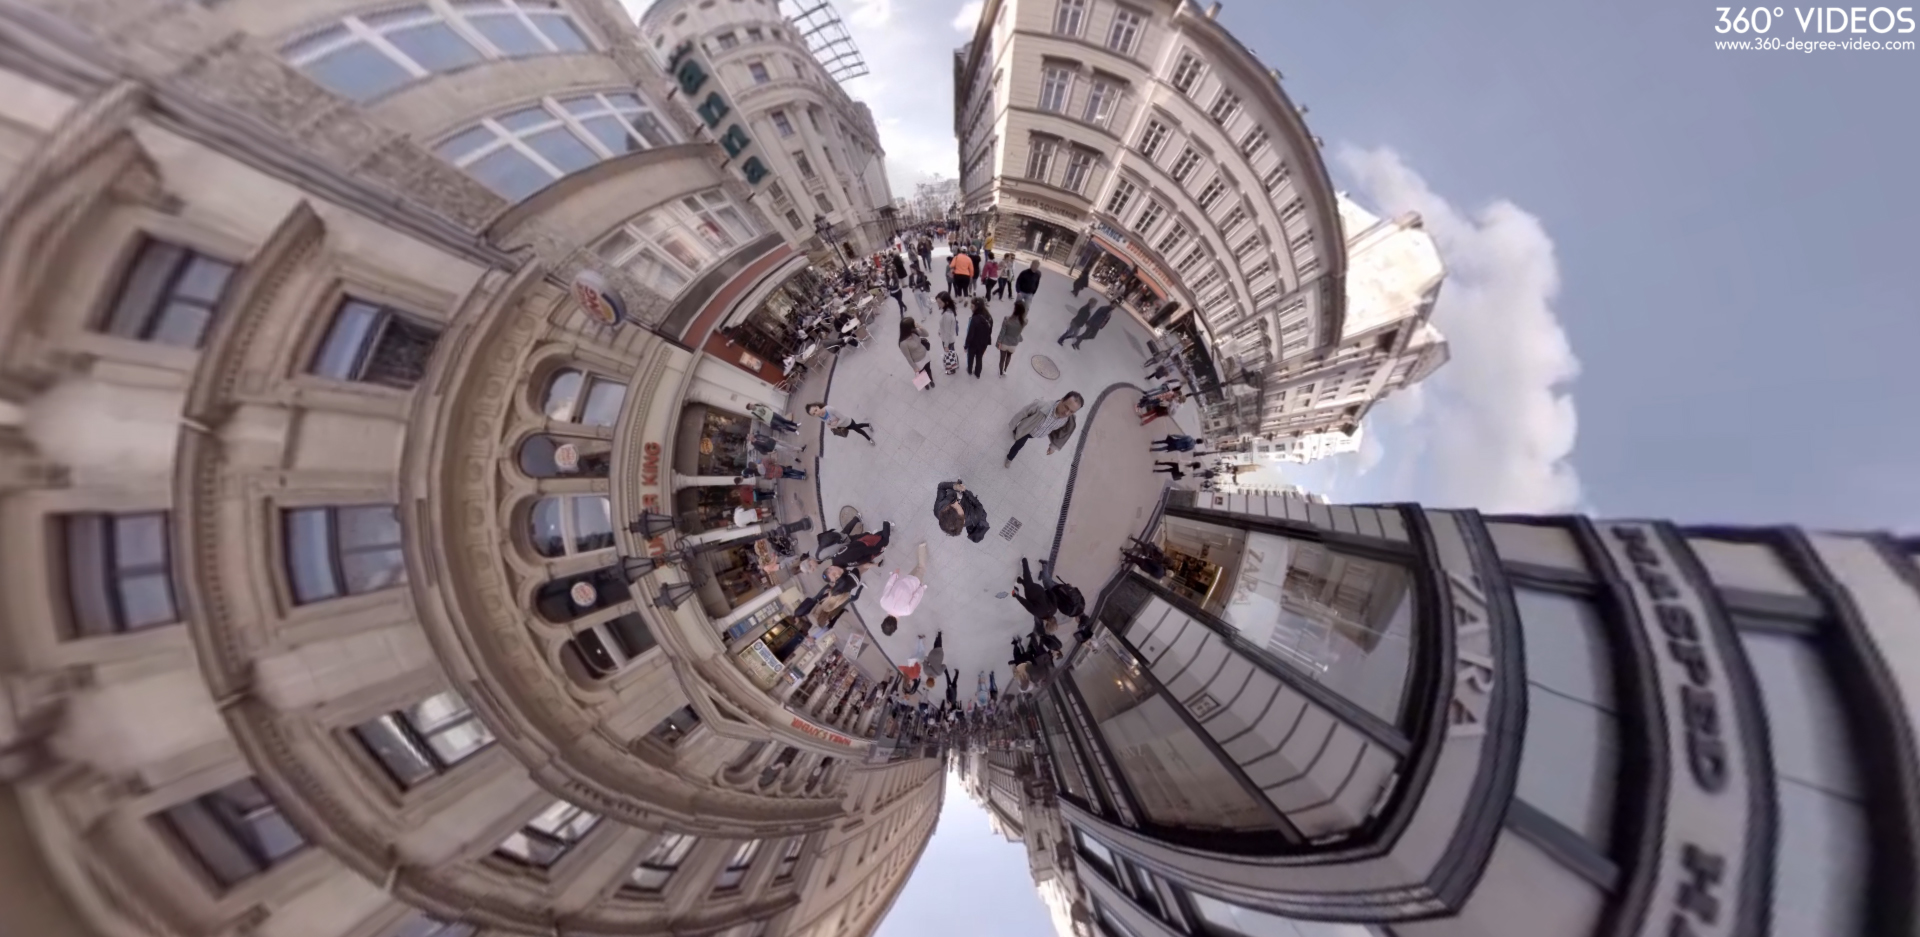 budapest 360 video